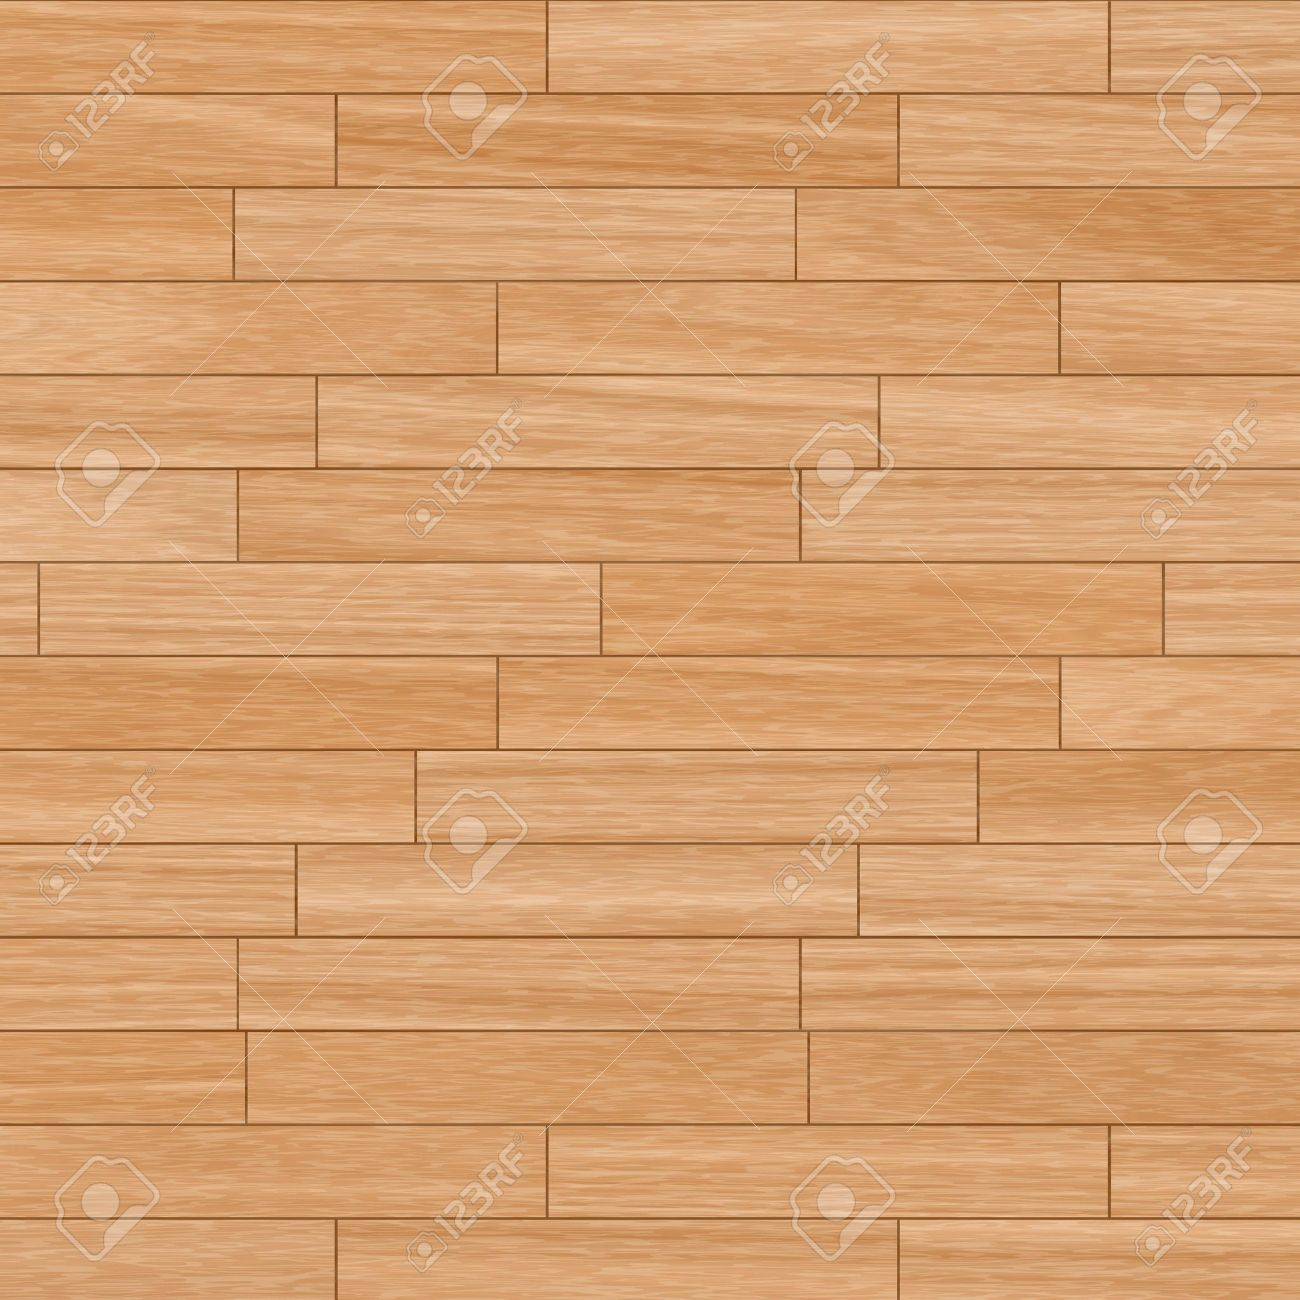 stock photo - wooden parquet flooring surface pattern texture seamless  background EOOSLVA